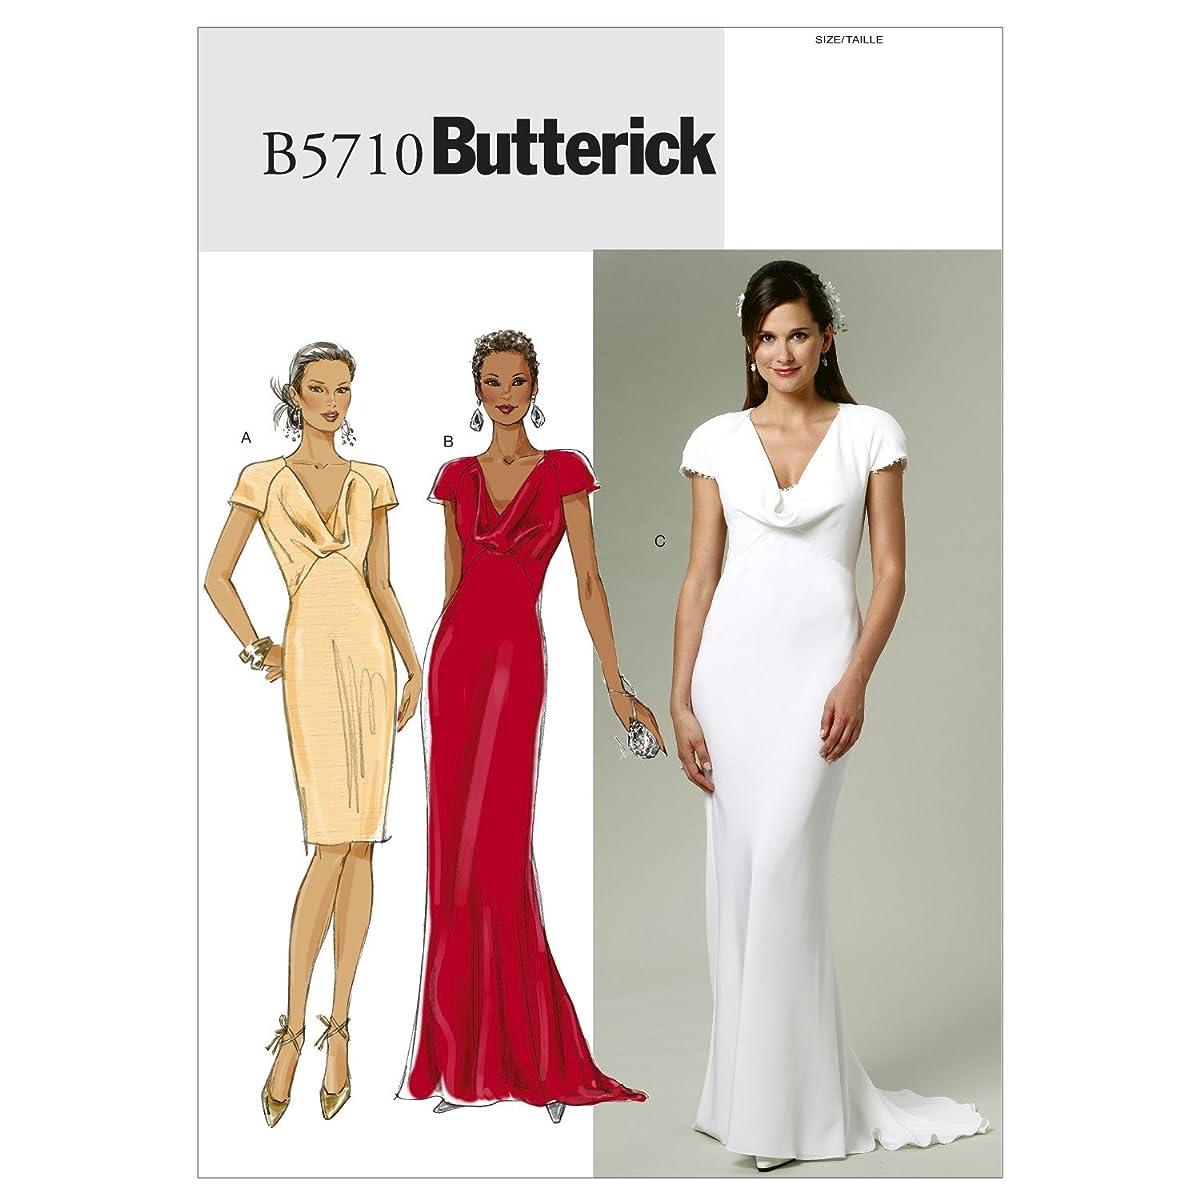 BUTTERICK PATTERNS B5710 Misses' Dress, Size A5 (6-8-10-12-14)